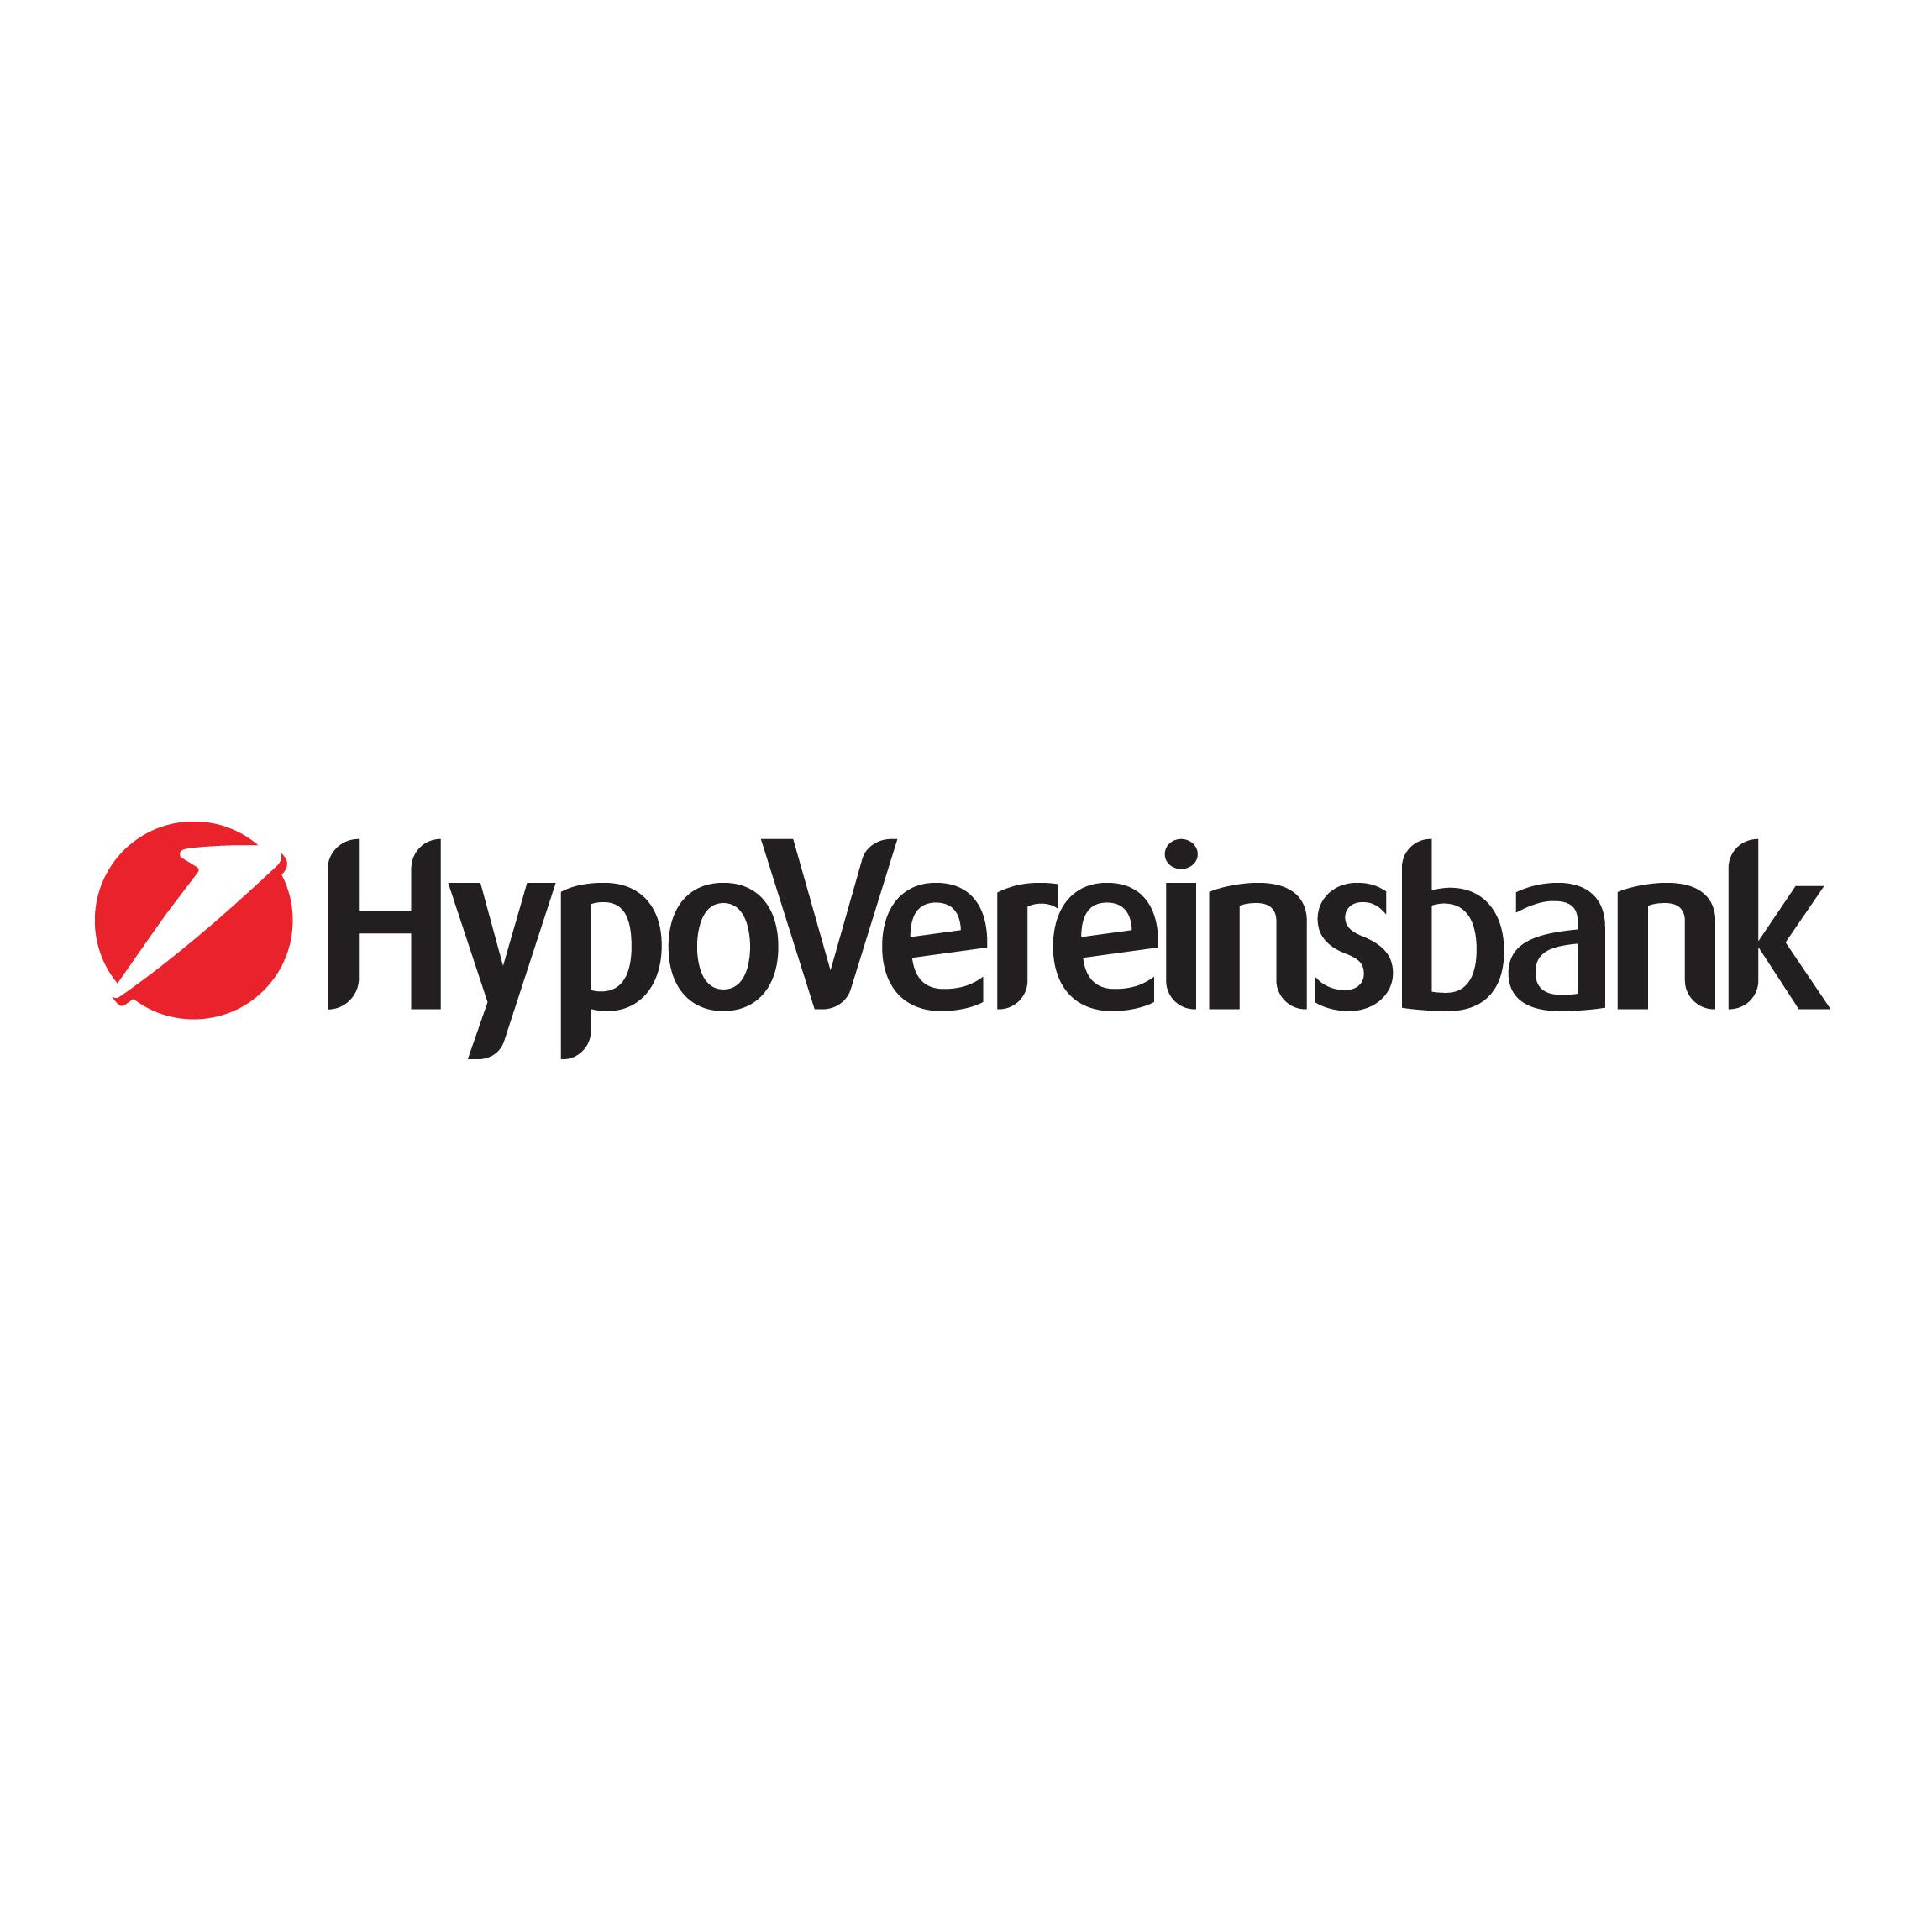 HypoVereinsbank Regensburg Gewerbepark